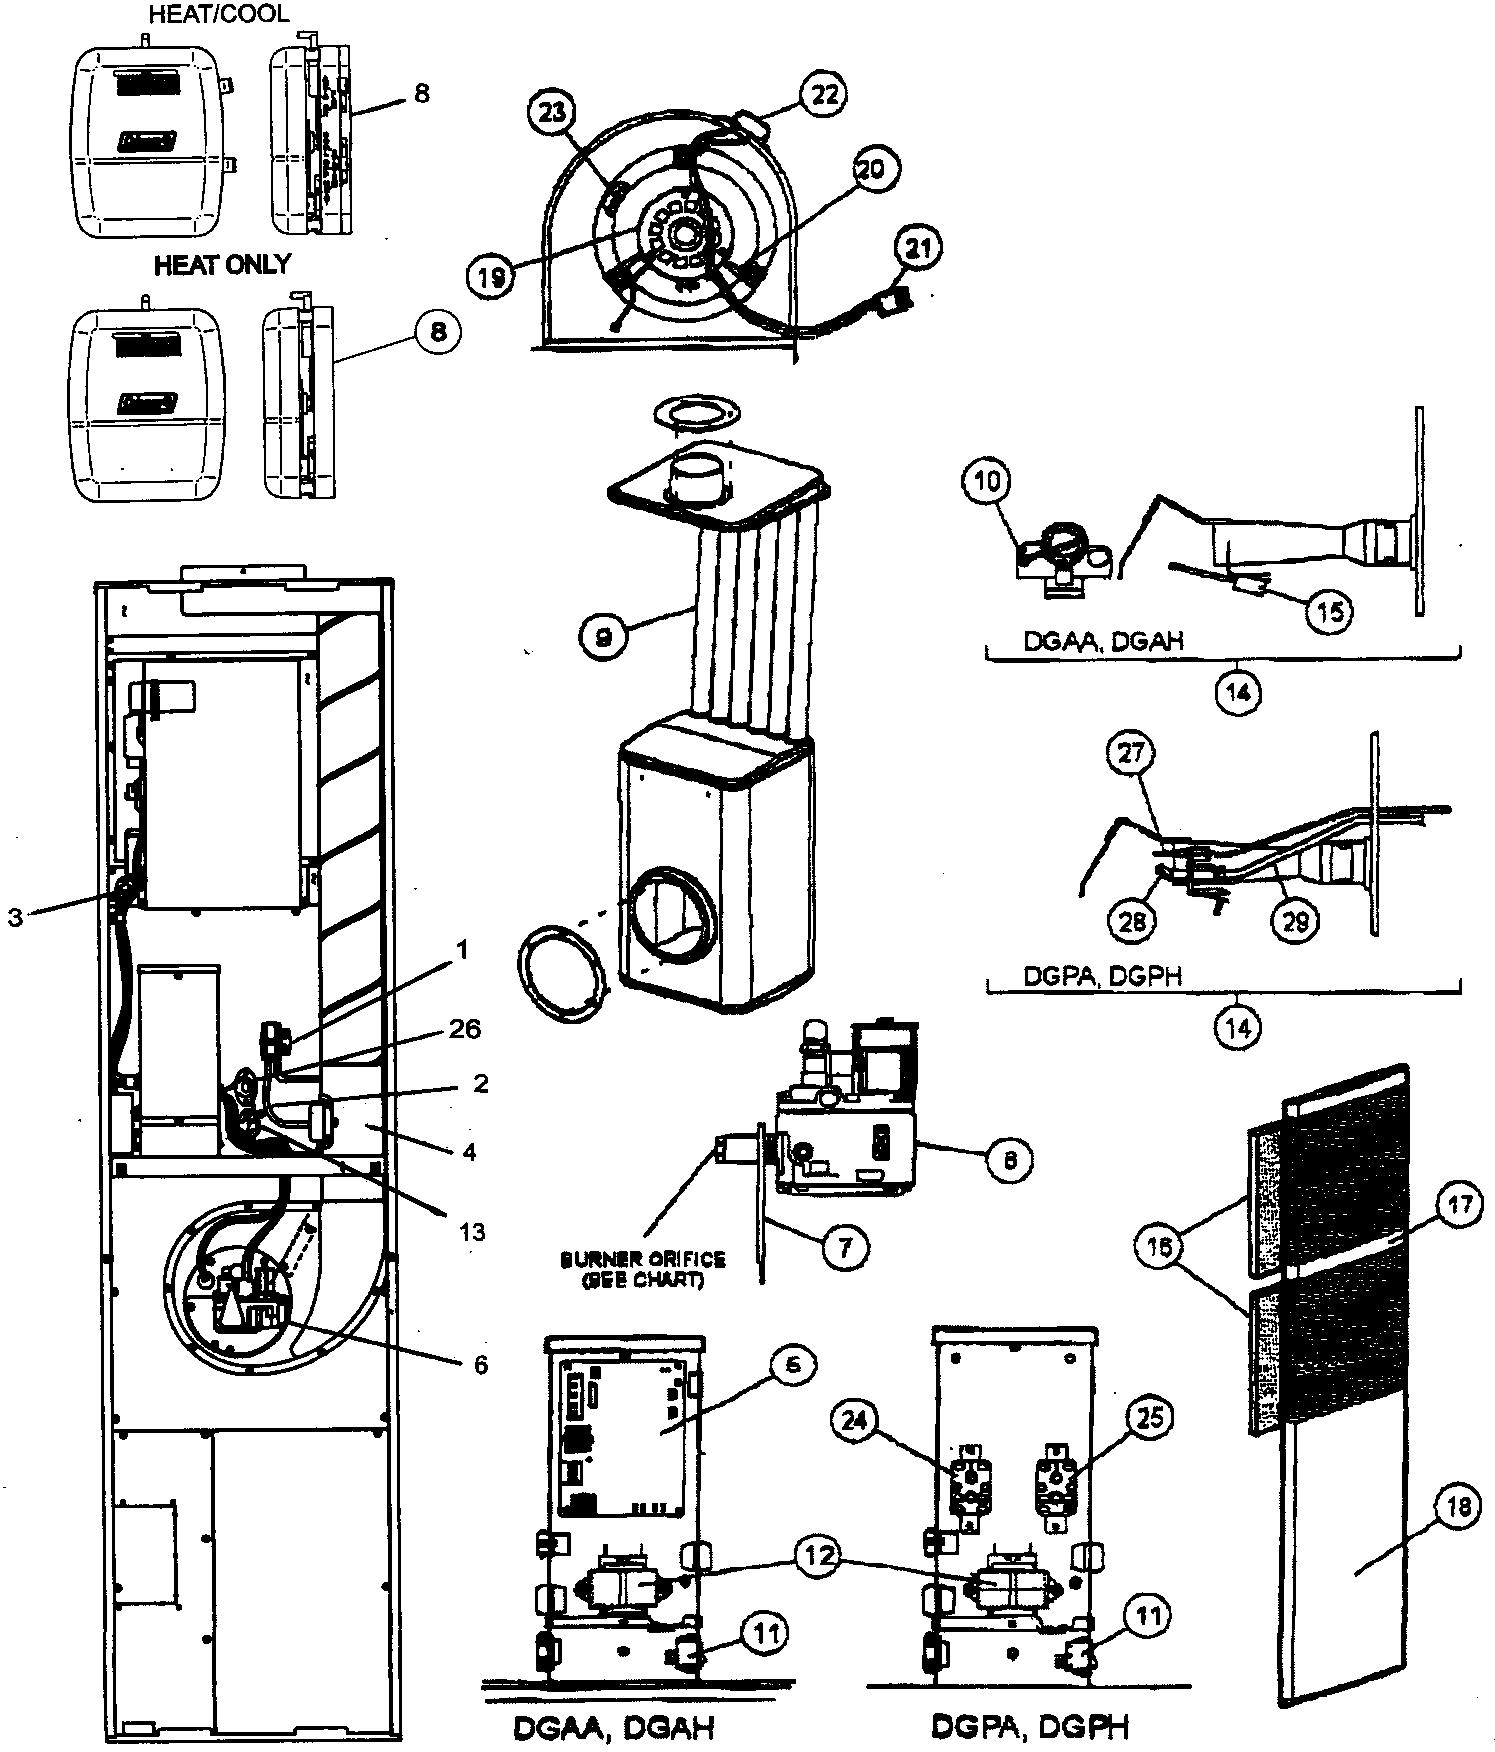 hight resolution of coleman furnace schematics wiring diagram mega coleman furnace schematics